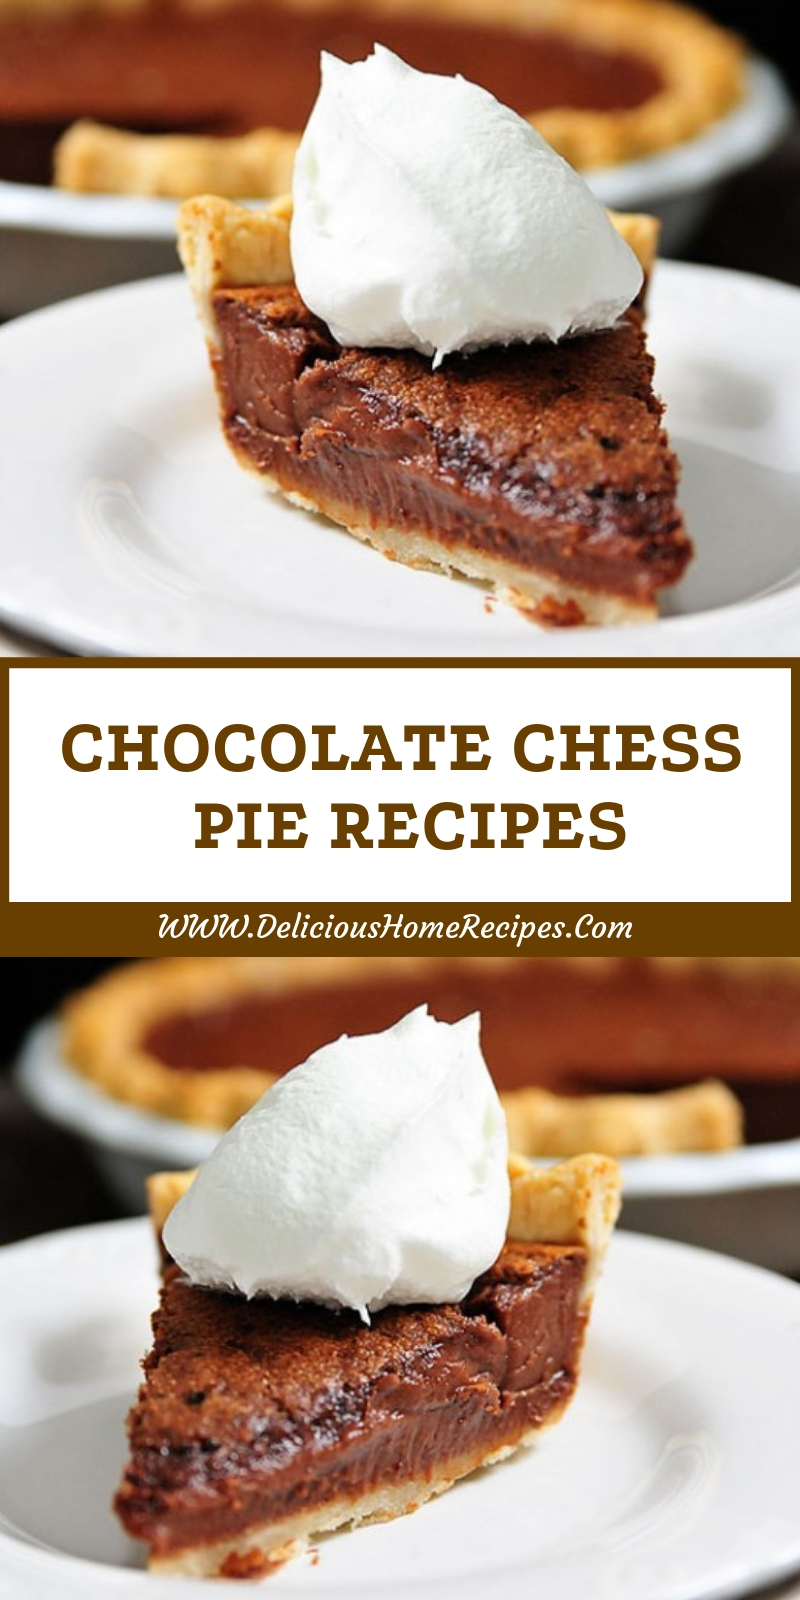 Chocolate Chess Pie Recipes